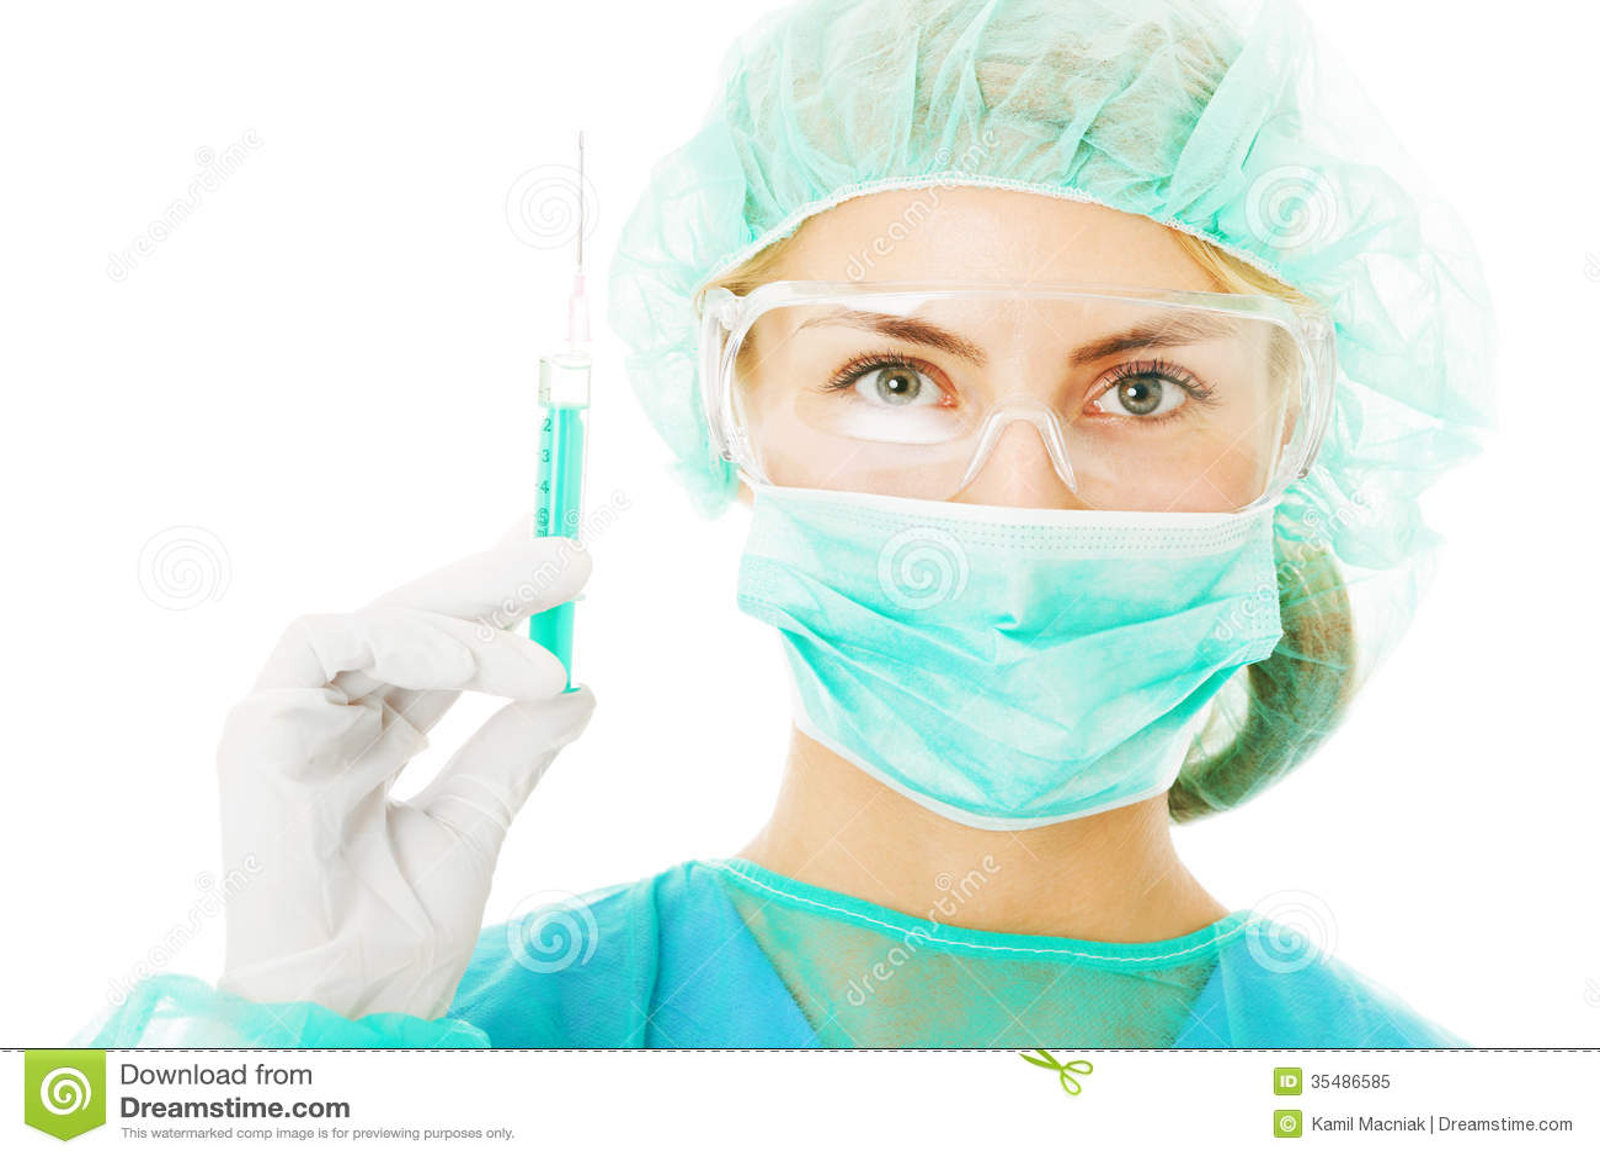 Surgeon Royalty Free Stock Photo - Image: 35486585